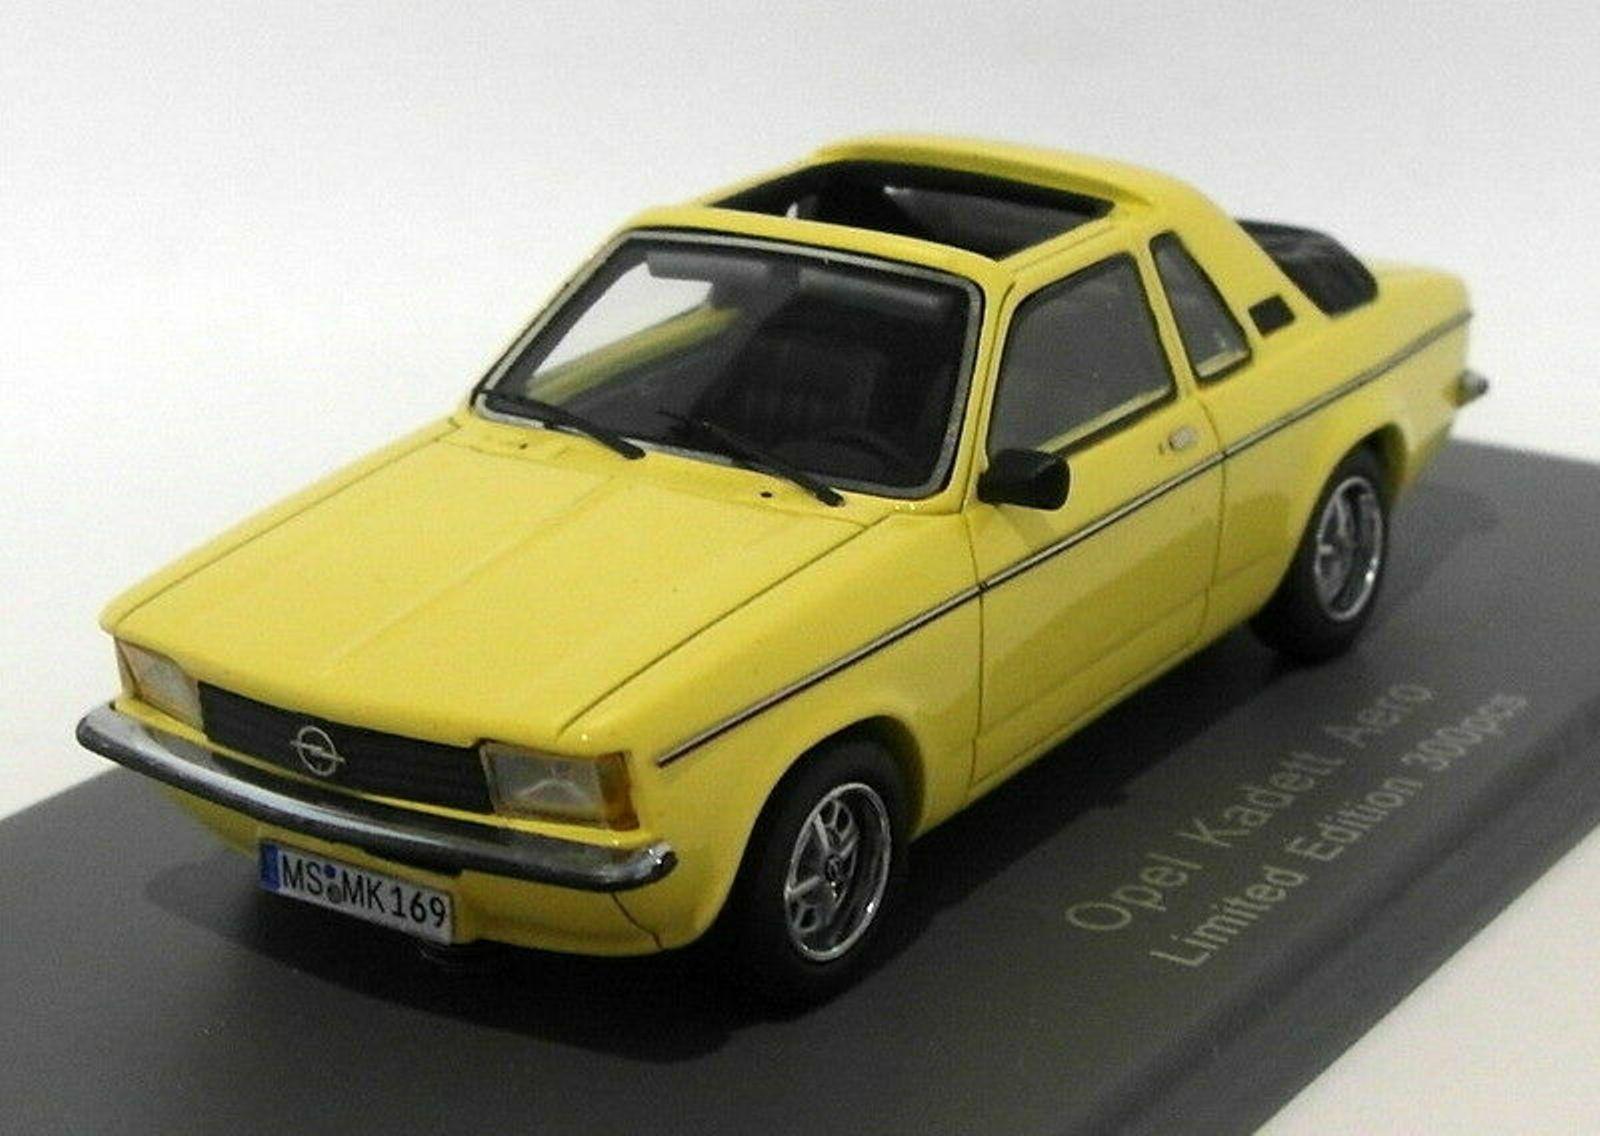 OPEL KADETT AERO OPEN ROOF jaune 1978 NEO 43078 1 43 300 PCS RESIN jaune APERTO